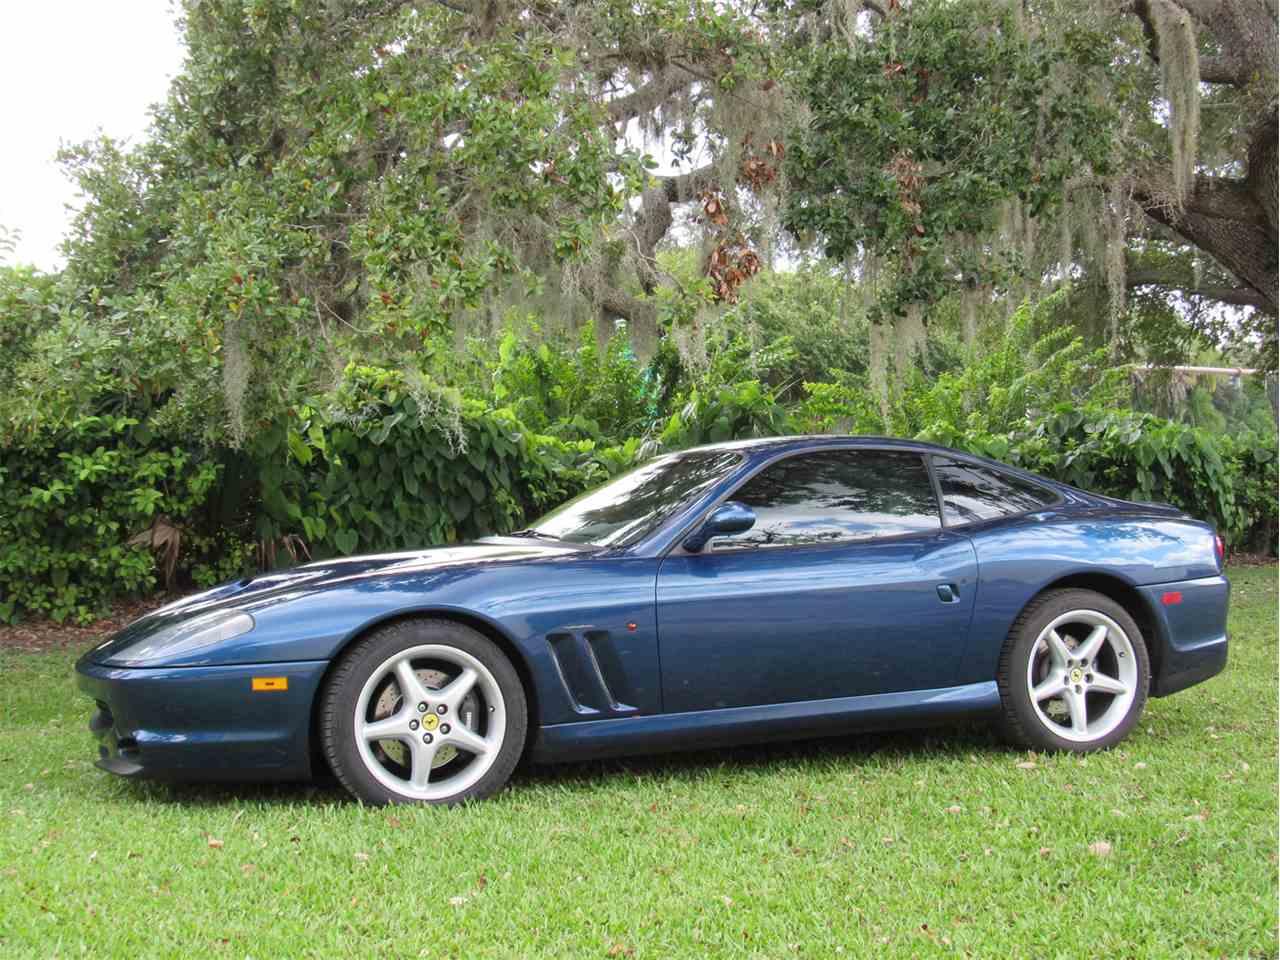 Large Picture of '98 Ferrari 550 Maranello - $119,900.00 Offered by Vintage Motors Sarasota - JAOV